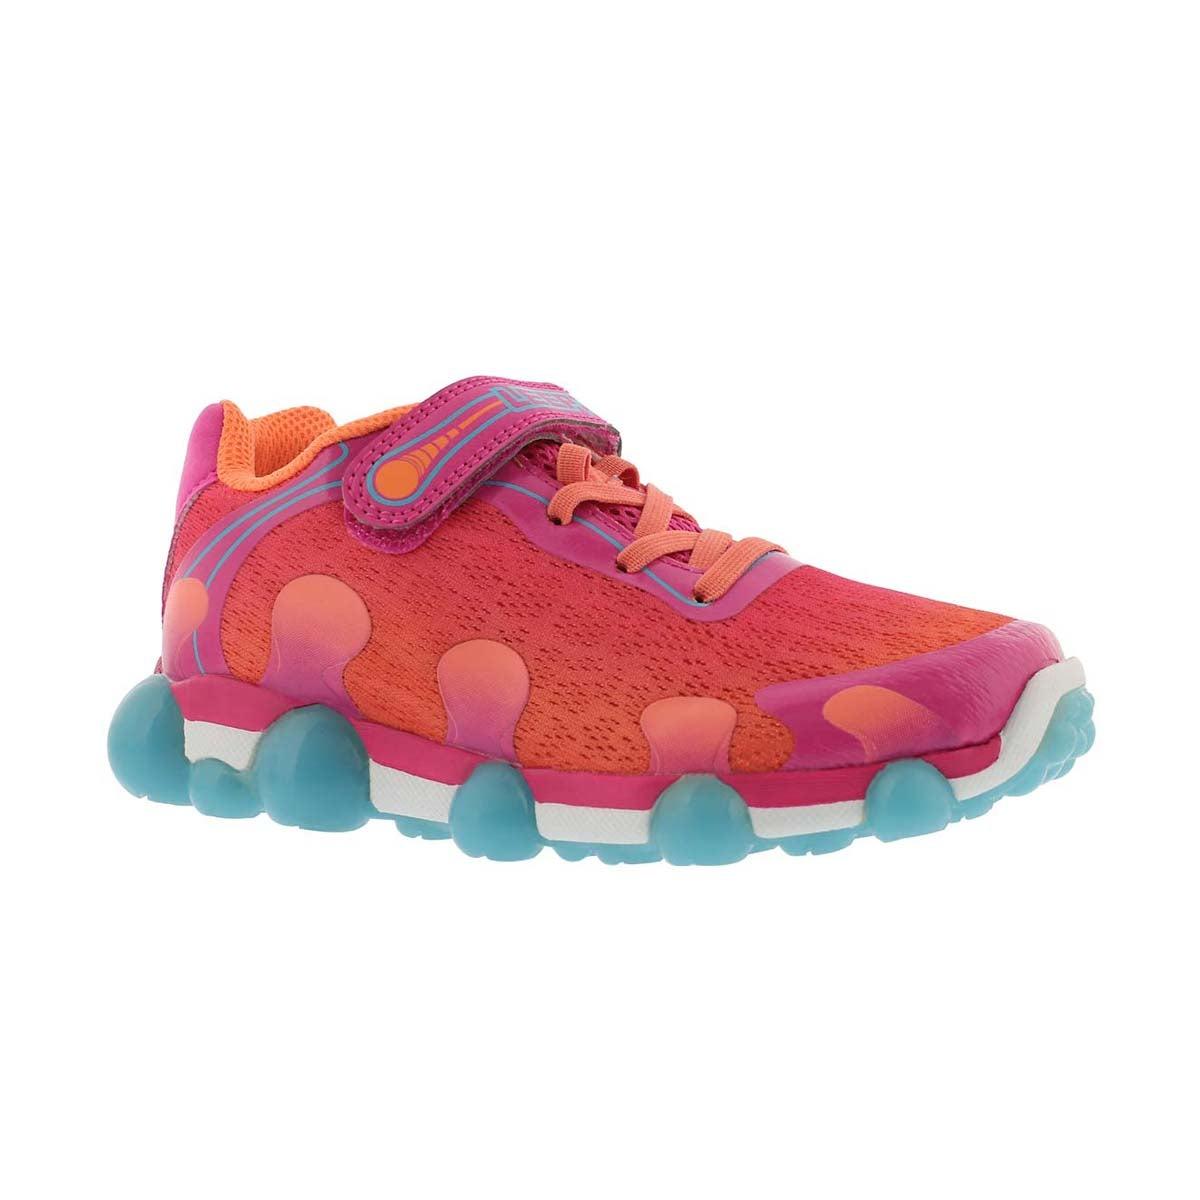 Girls LEEPZ 2.0 coral light up sneaker